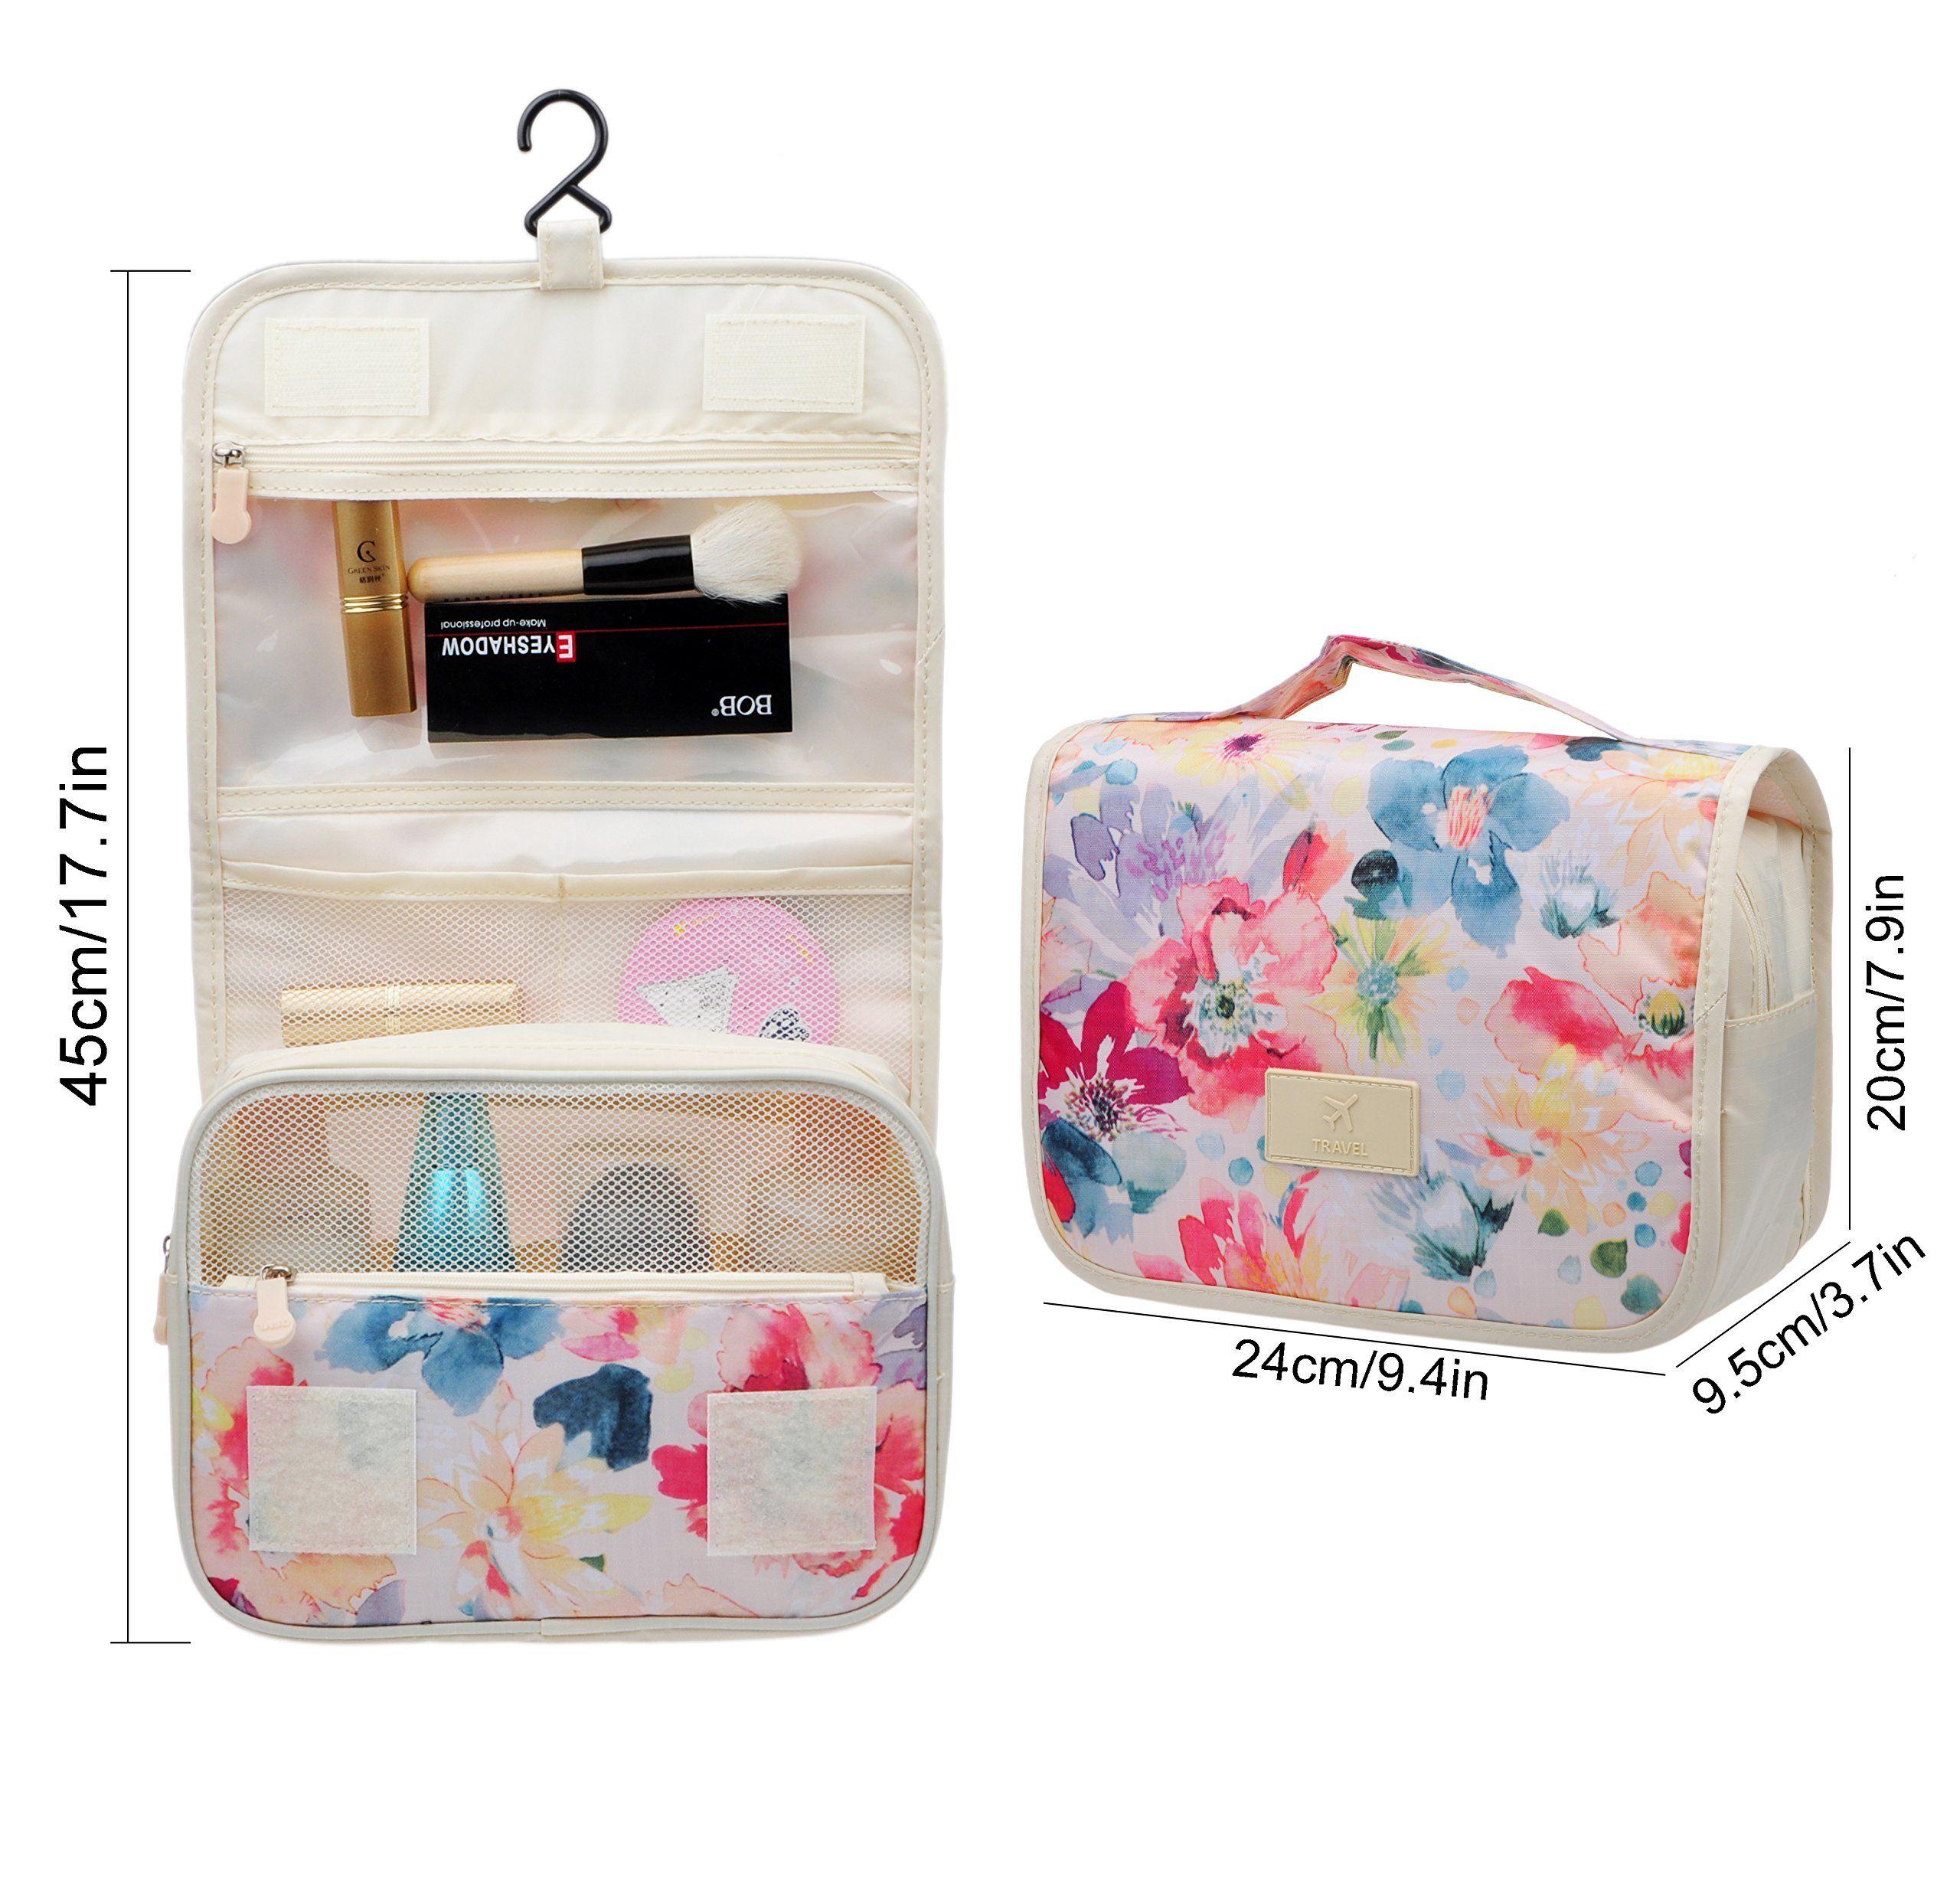 Cosmetic Makeup Bag CaseHanging Toiletry BagTravel